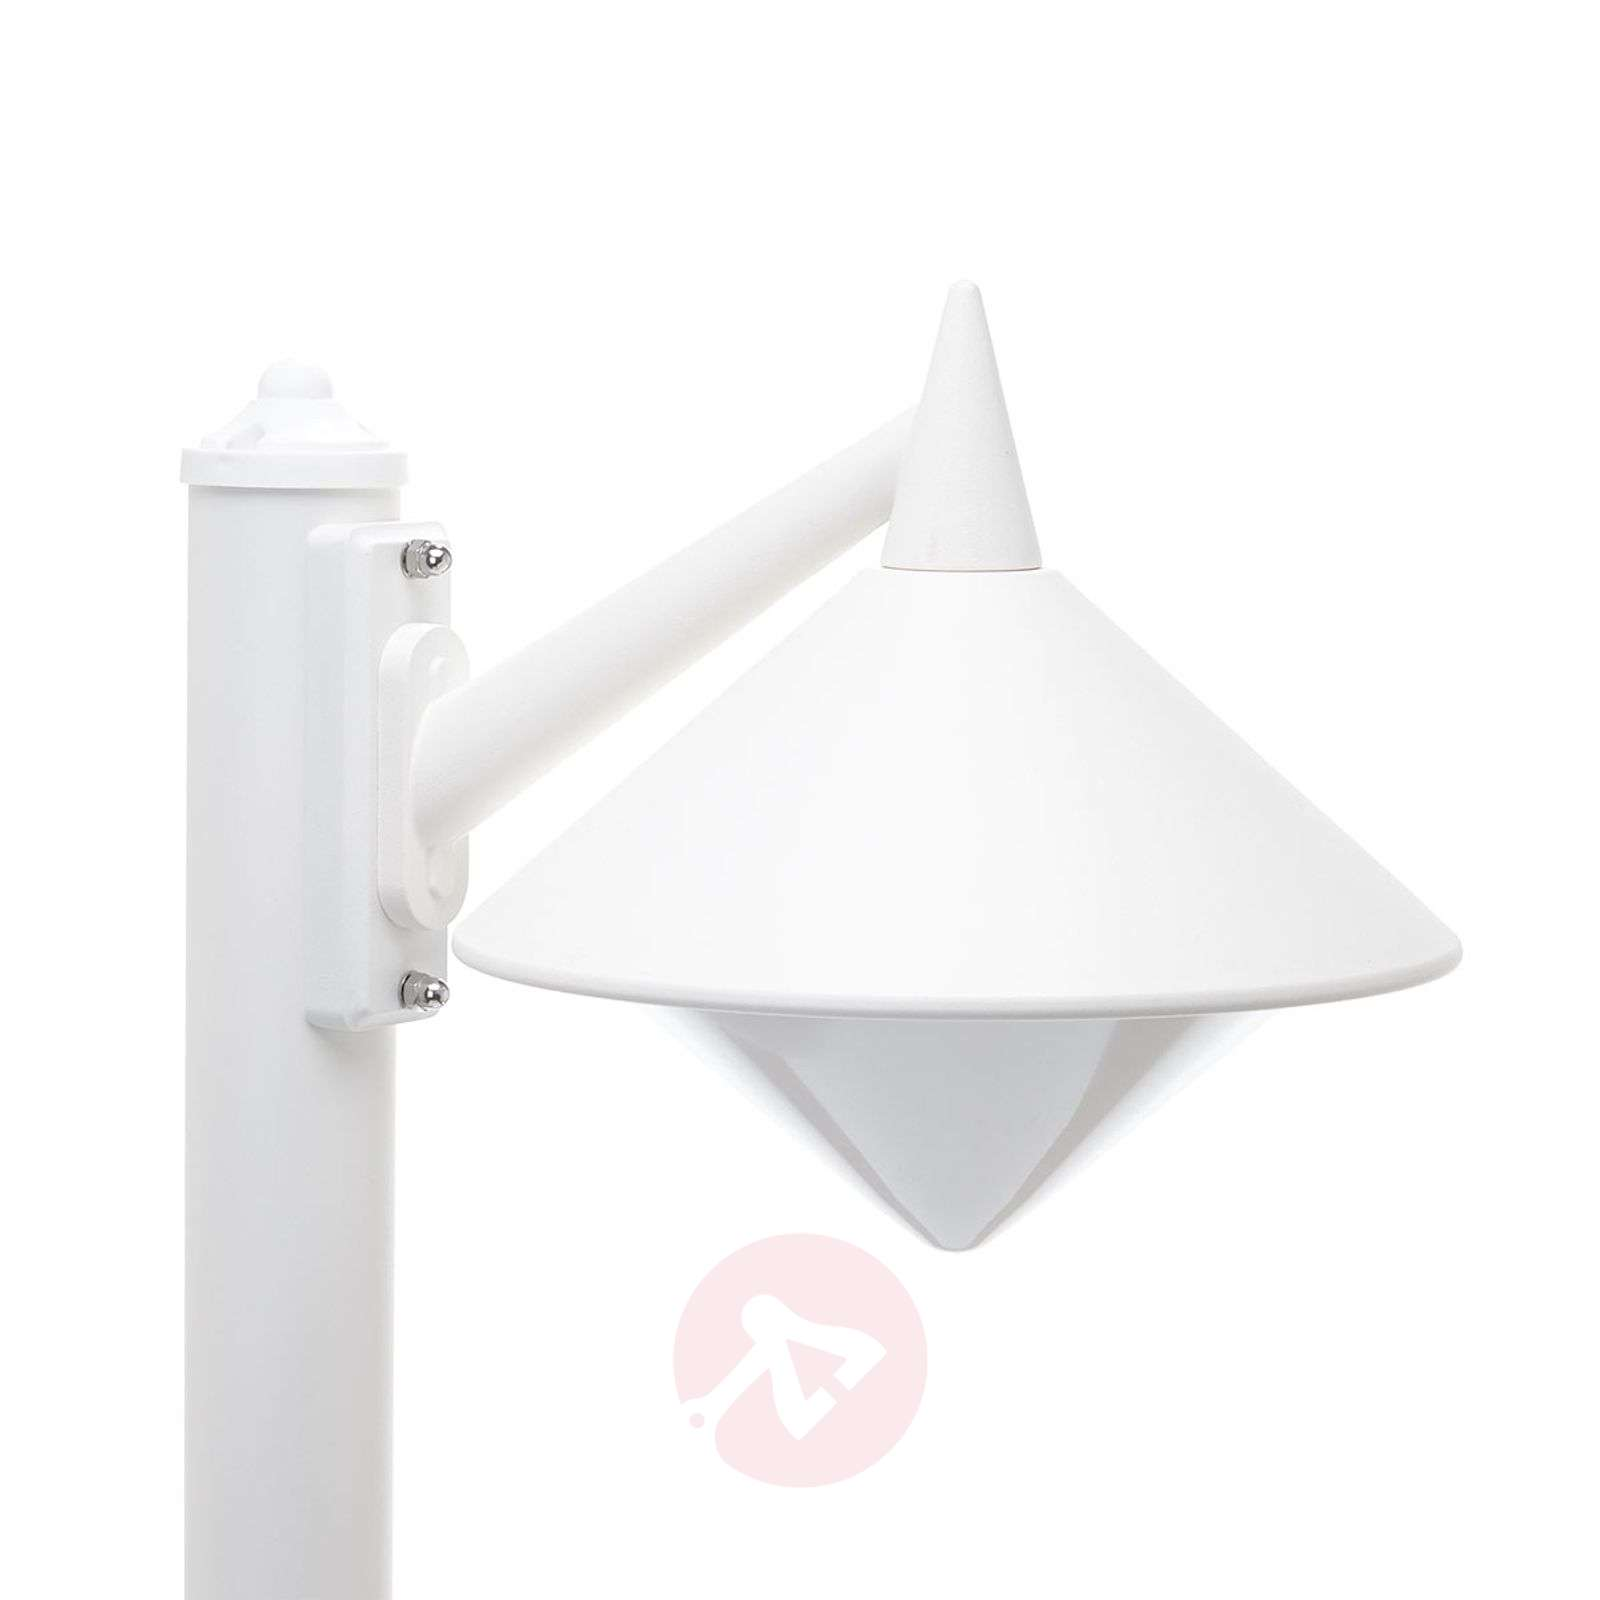 Seawater resistant path lamp Liara, white-6068077-01